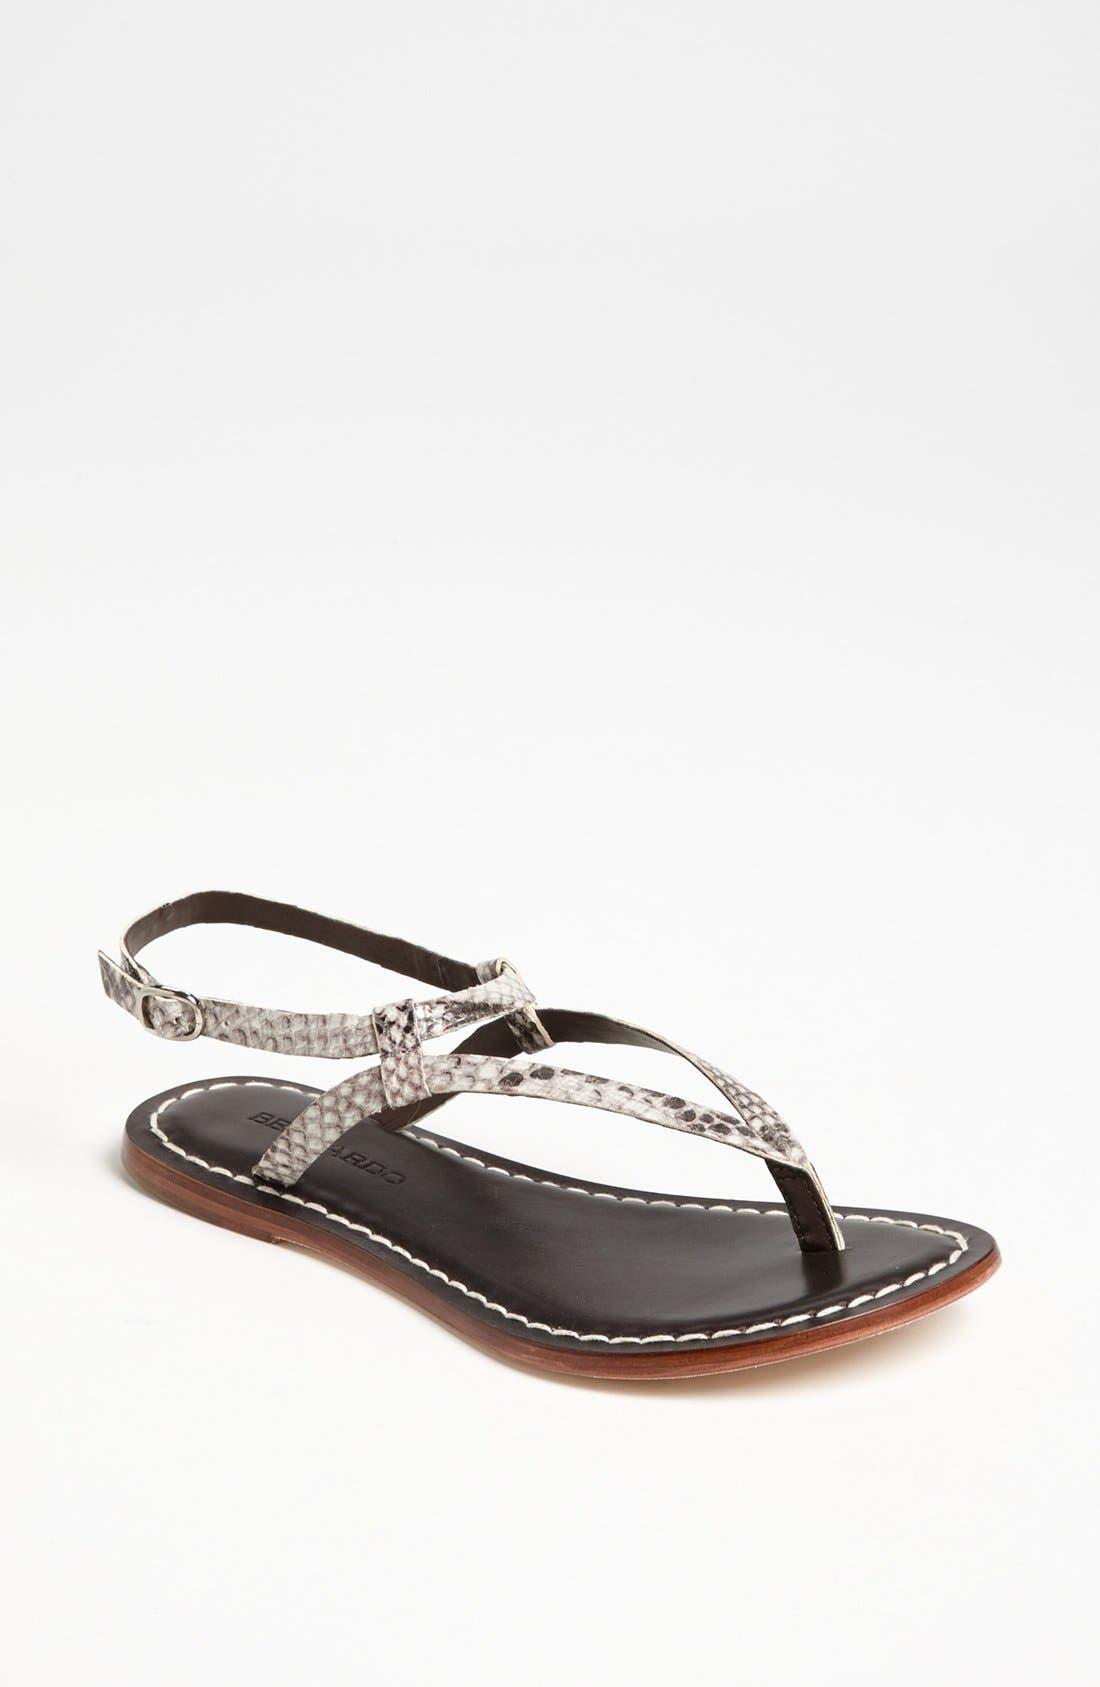 Main Image - Bernardo Footwear Merit Sandal